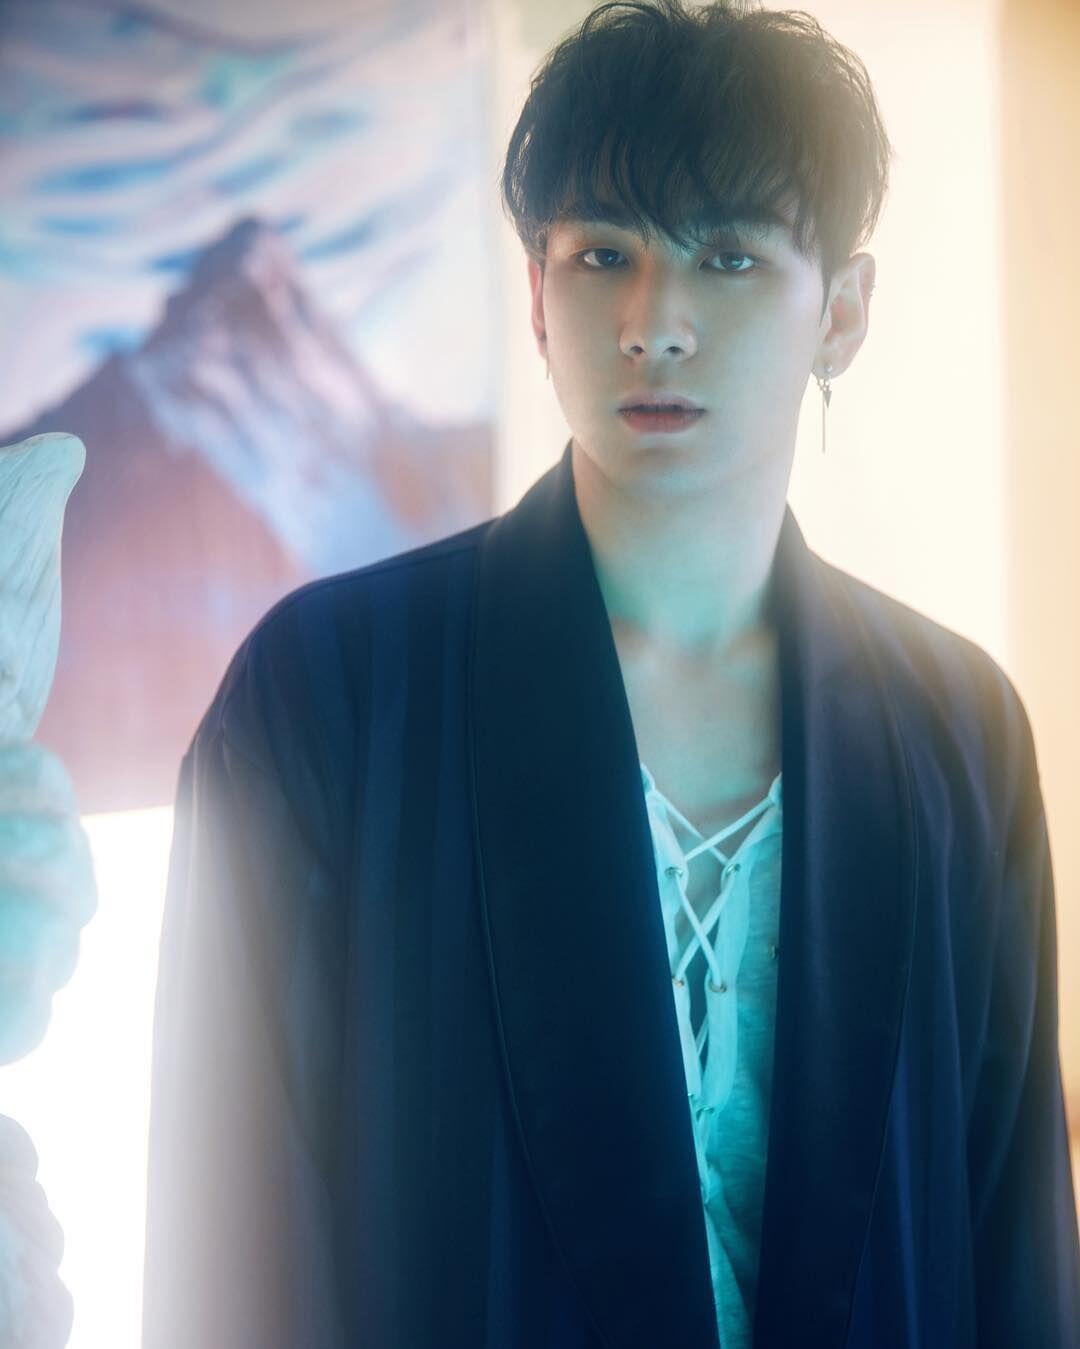 15 Idola Kpop Beken Ini Ulang Tahunnya di Bulan Juli Lho!